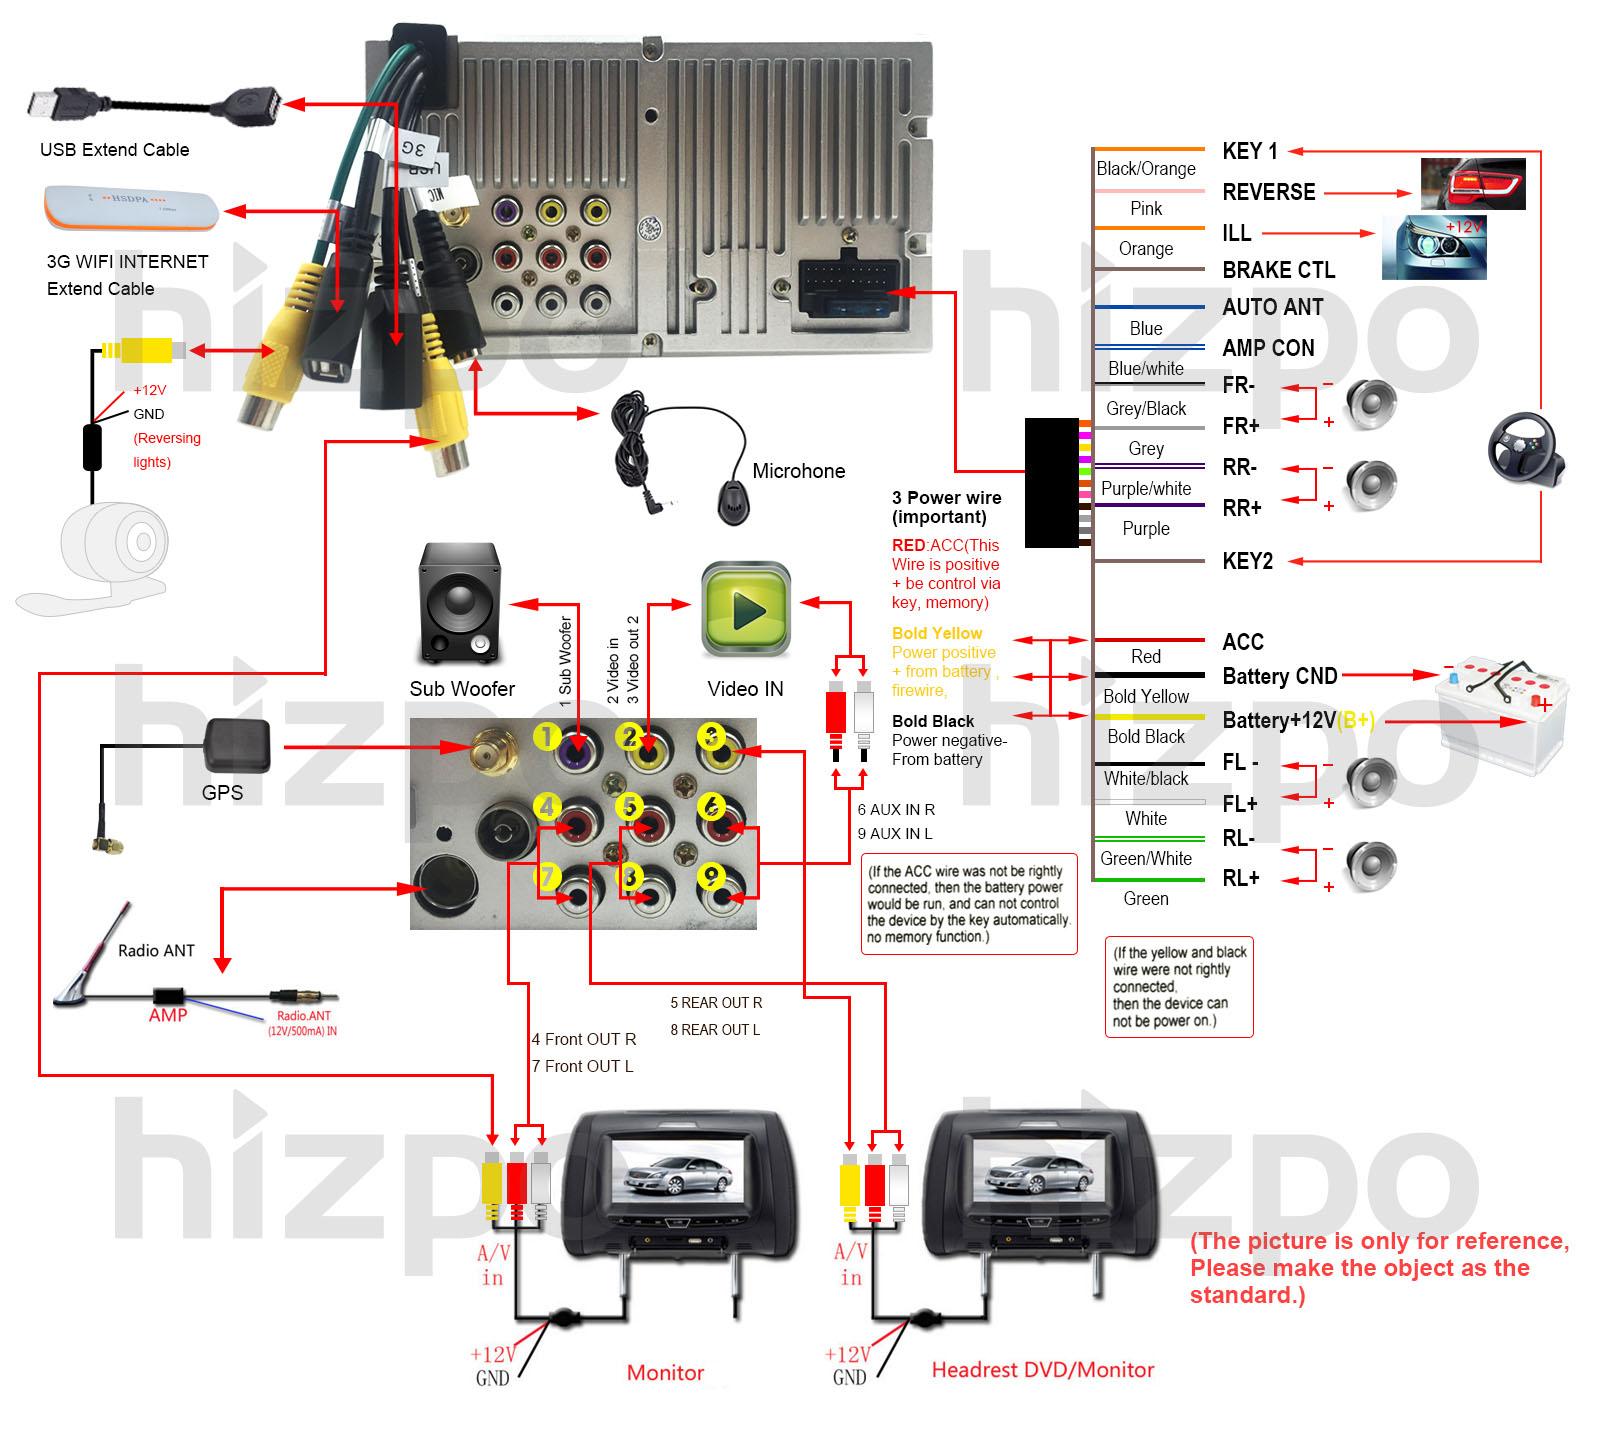 Wiring diagram avic n1 car keys can ca850 wiring diagram pdf toyota wiring diagram avic n1 car dvd player www123wiringdiagramonline wiringdiagram 1 wiring diagram avic n1 car dvd cheapraybanclubmaster Choice Image